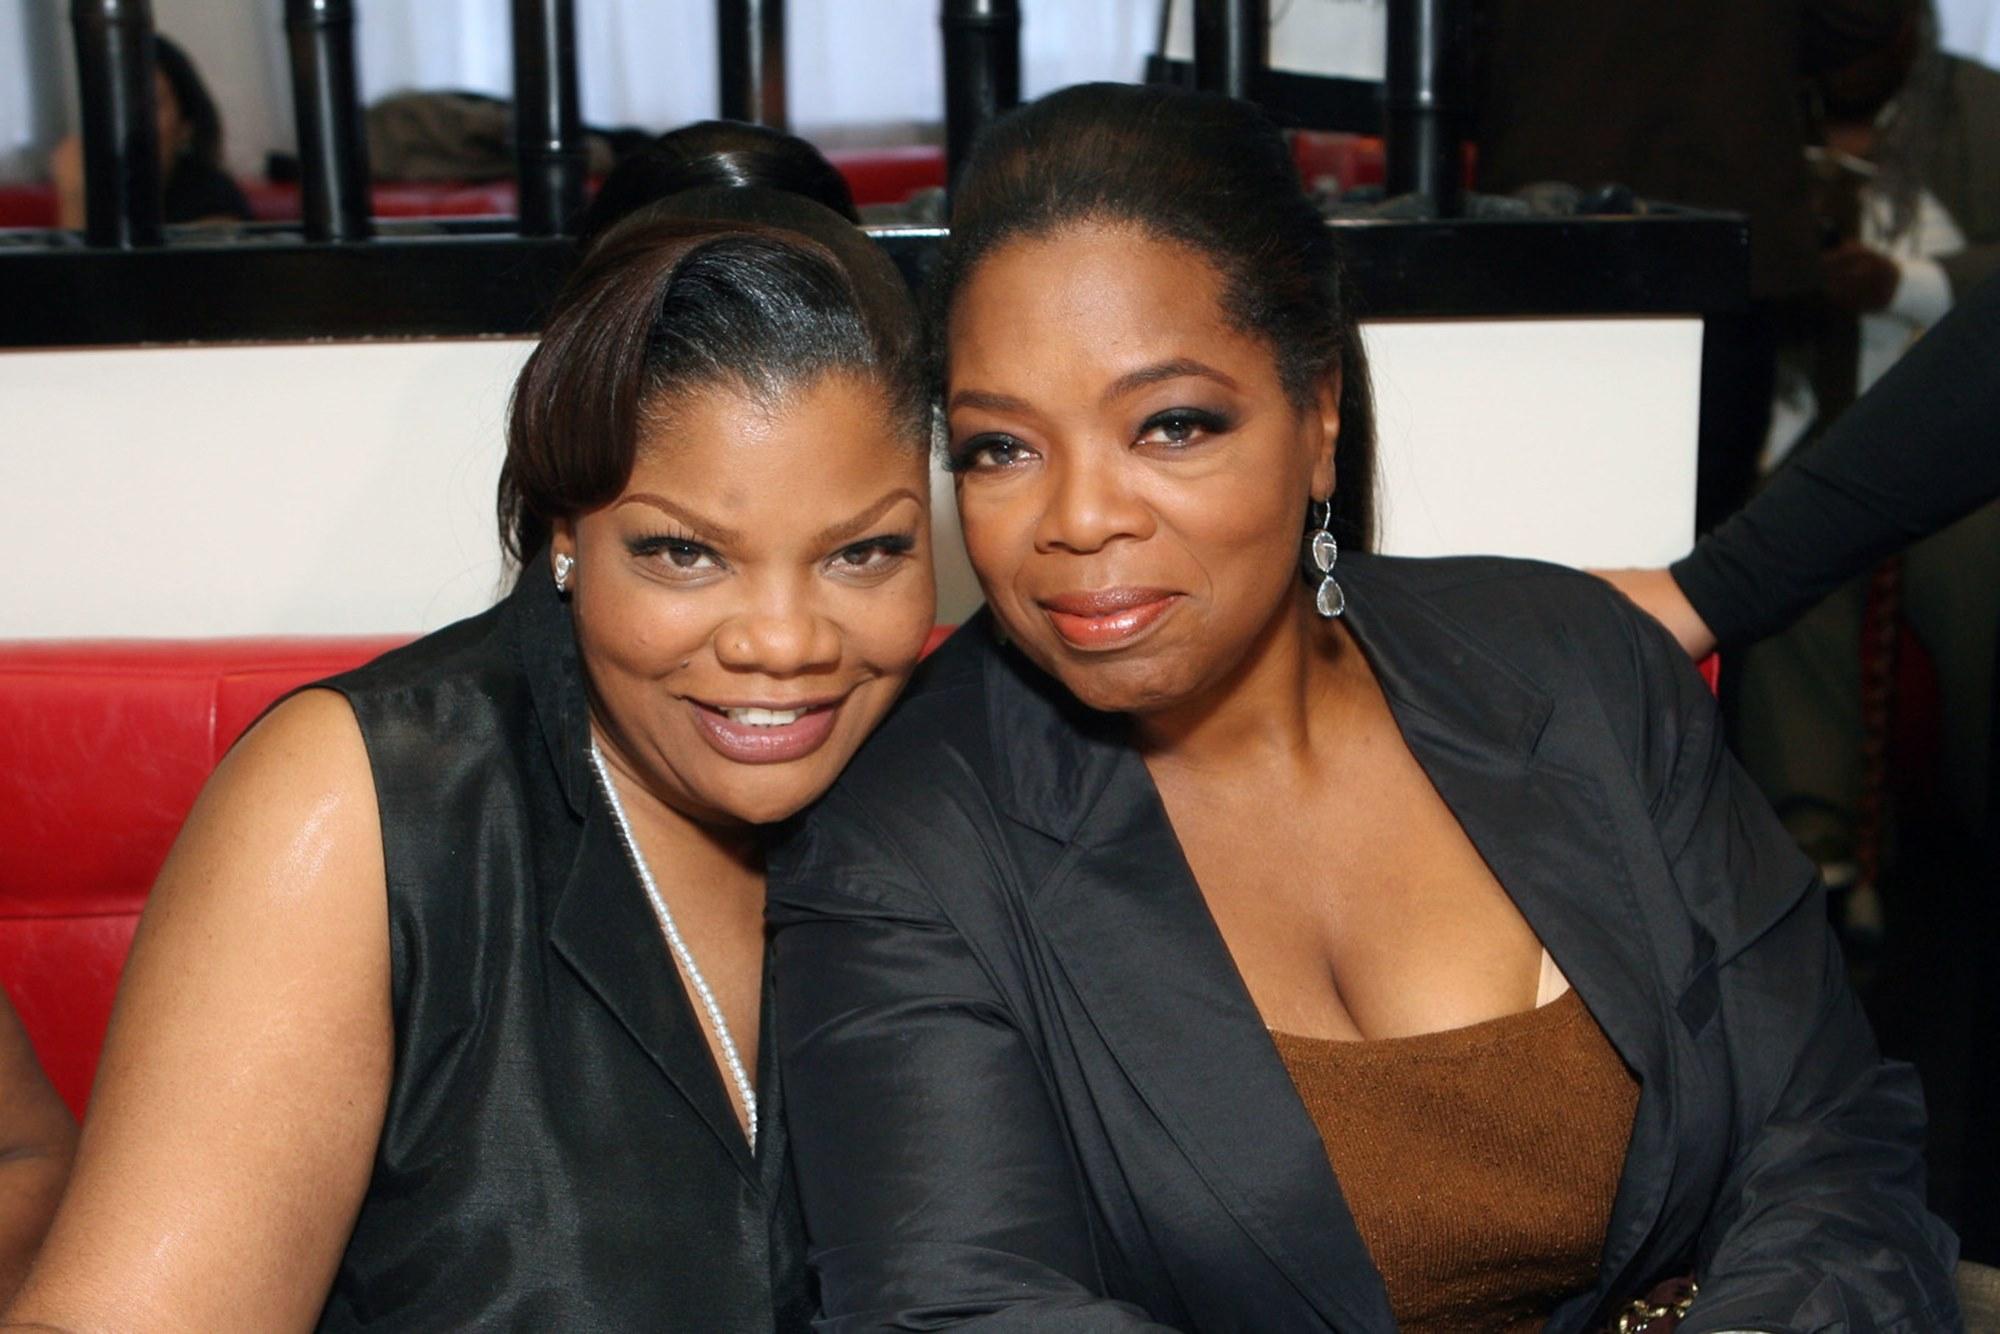 Mo'Nique Oprah Winfrey Feud Back On